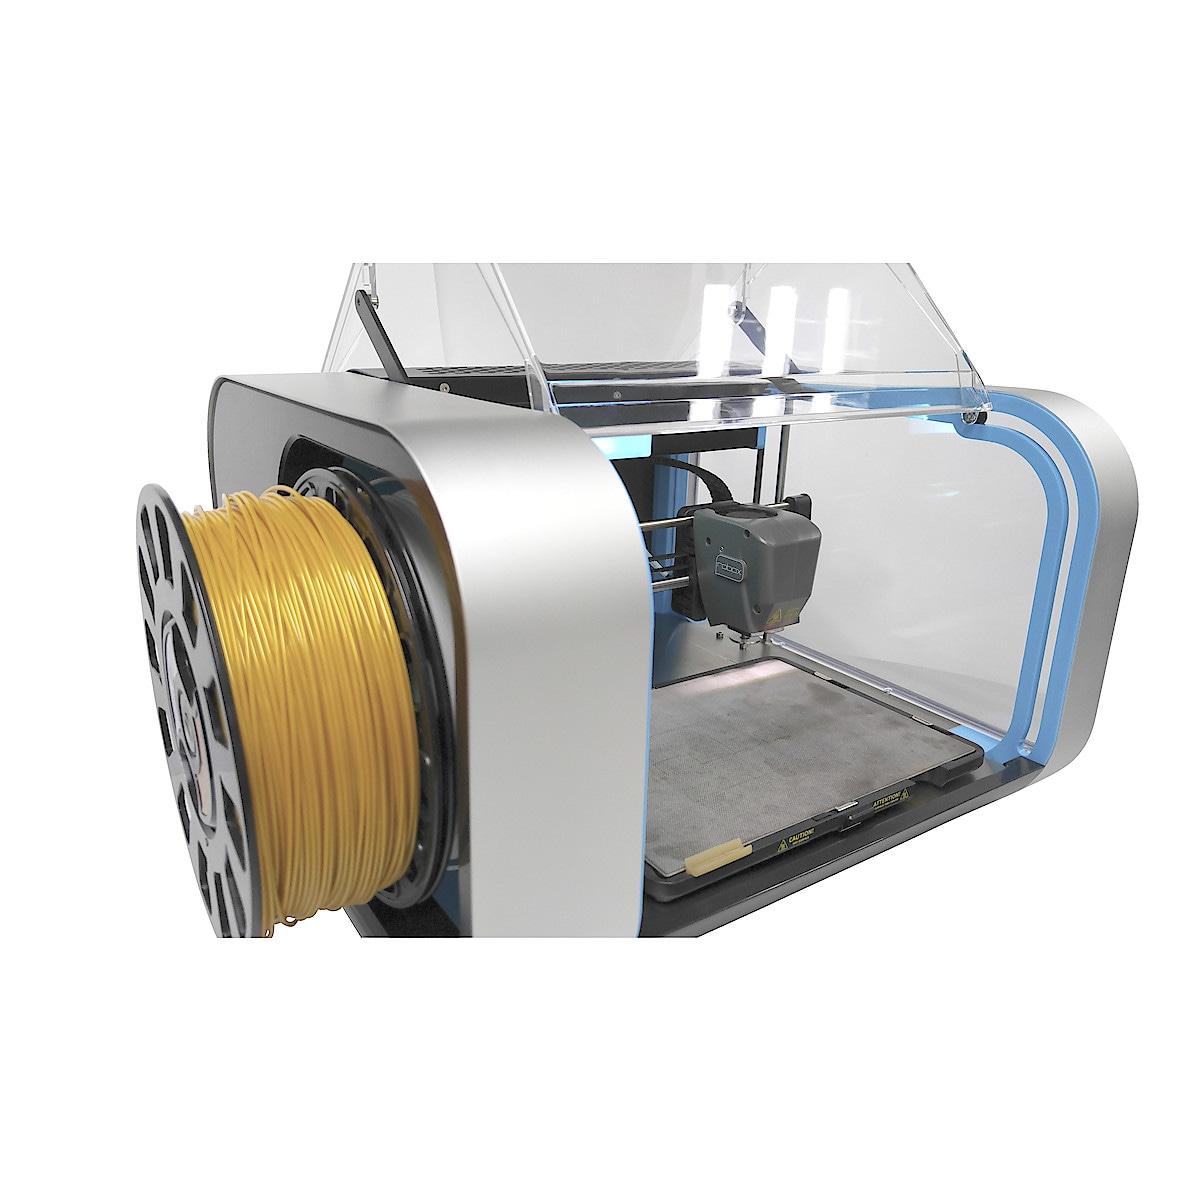 Robox 3D Printer with Dual Extruder